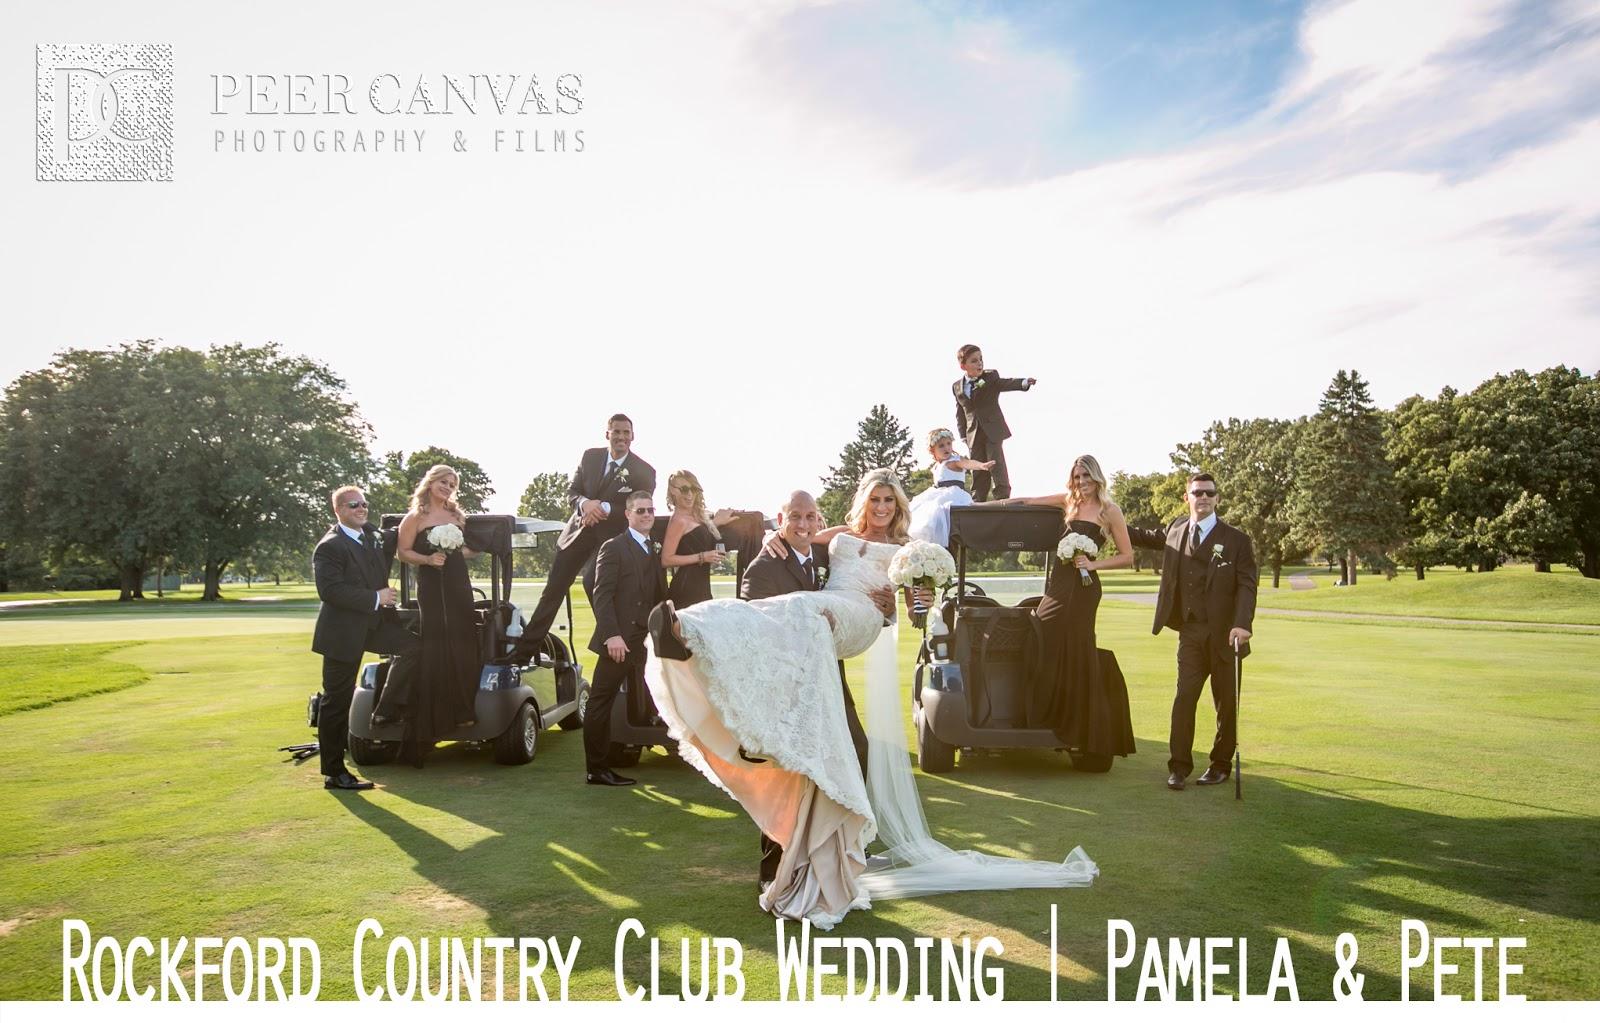 Rockford Country Club Golf Wedding Pamela Pete Peer Canvas Blog